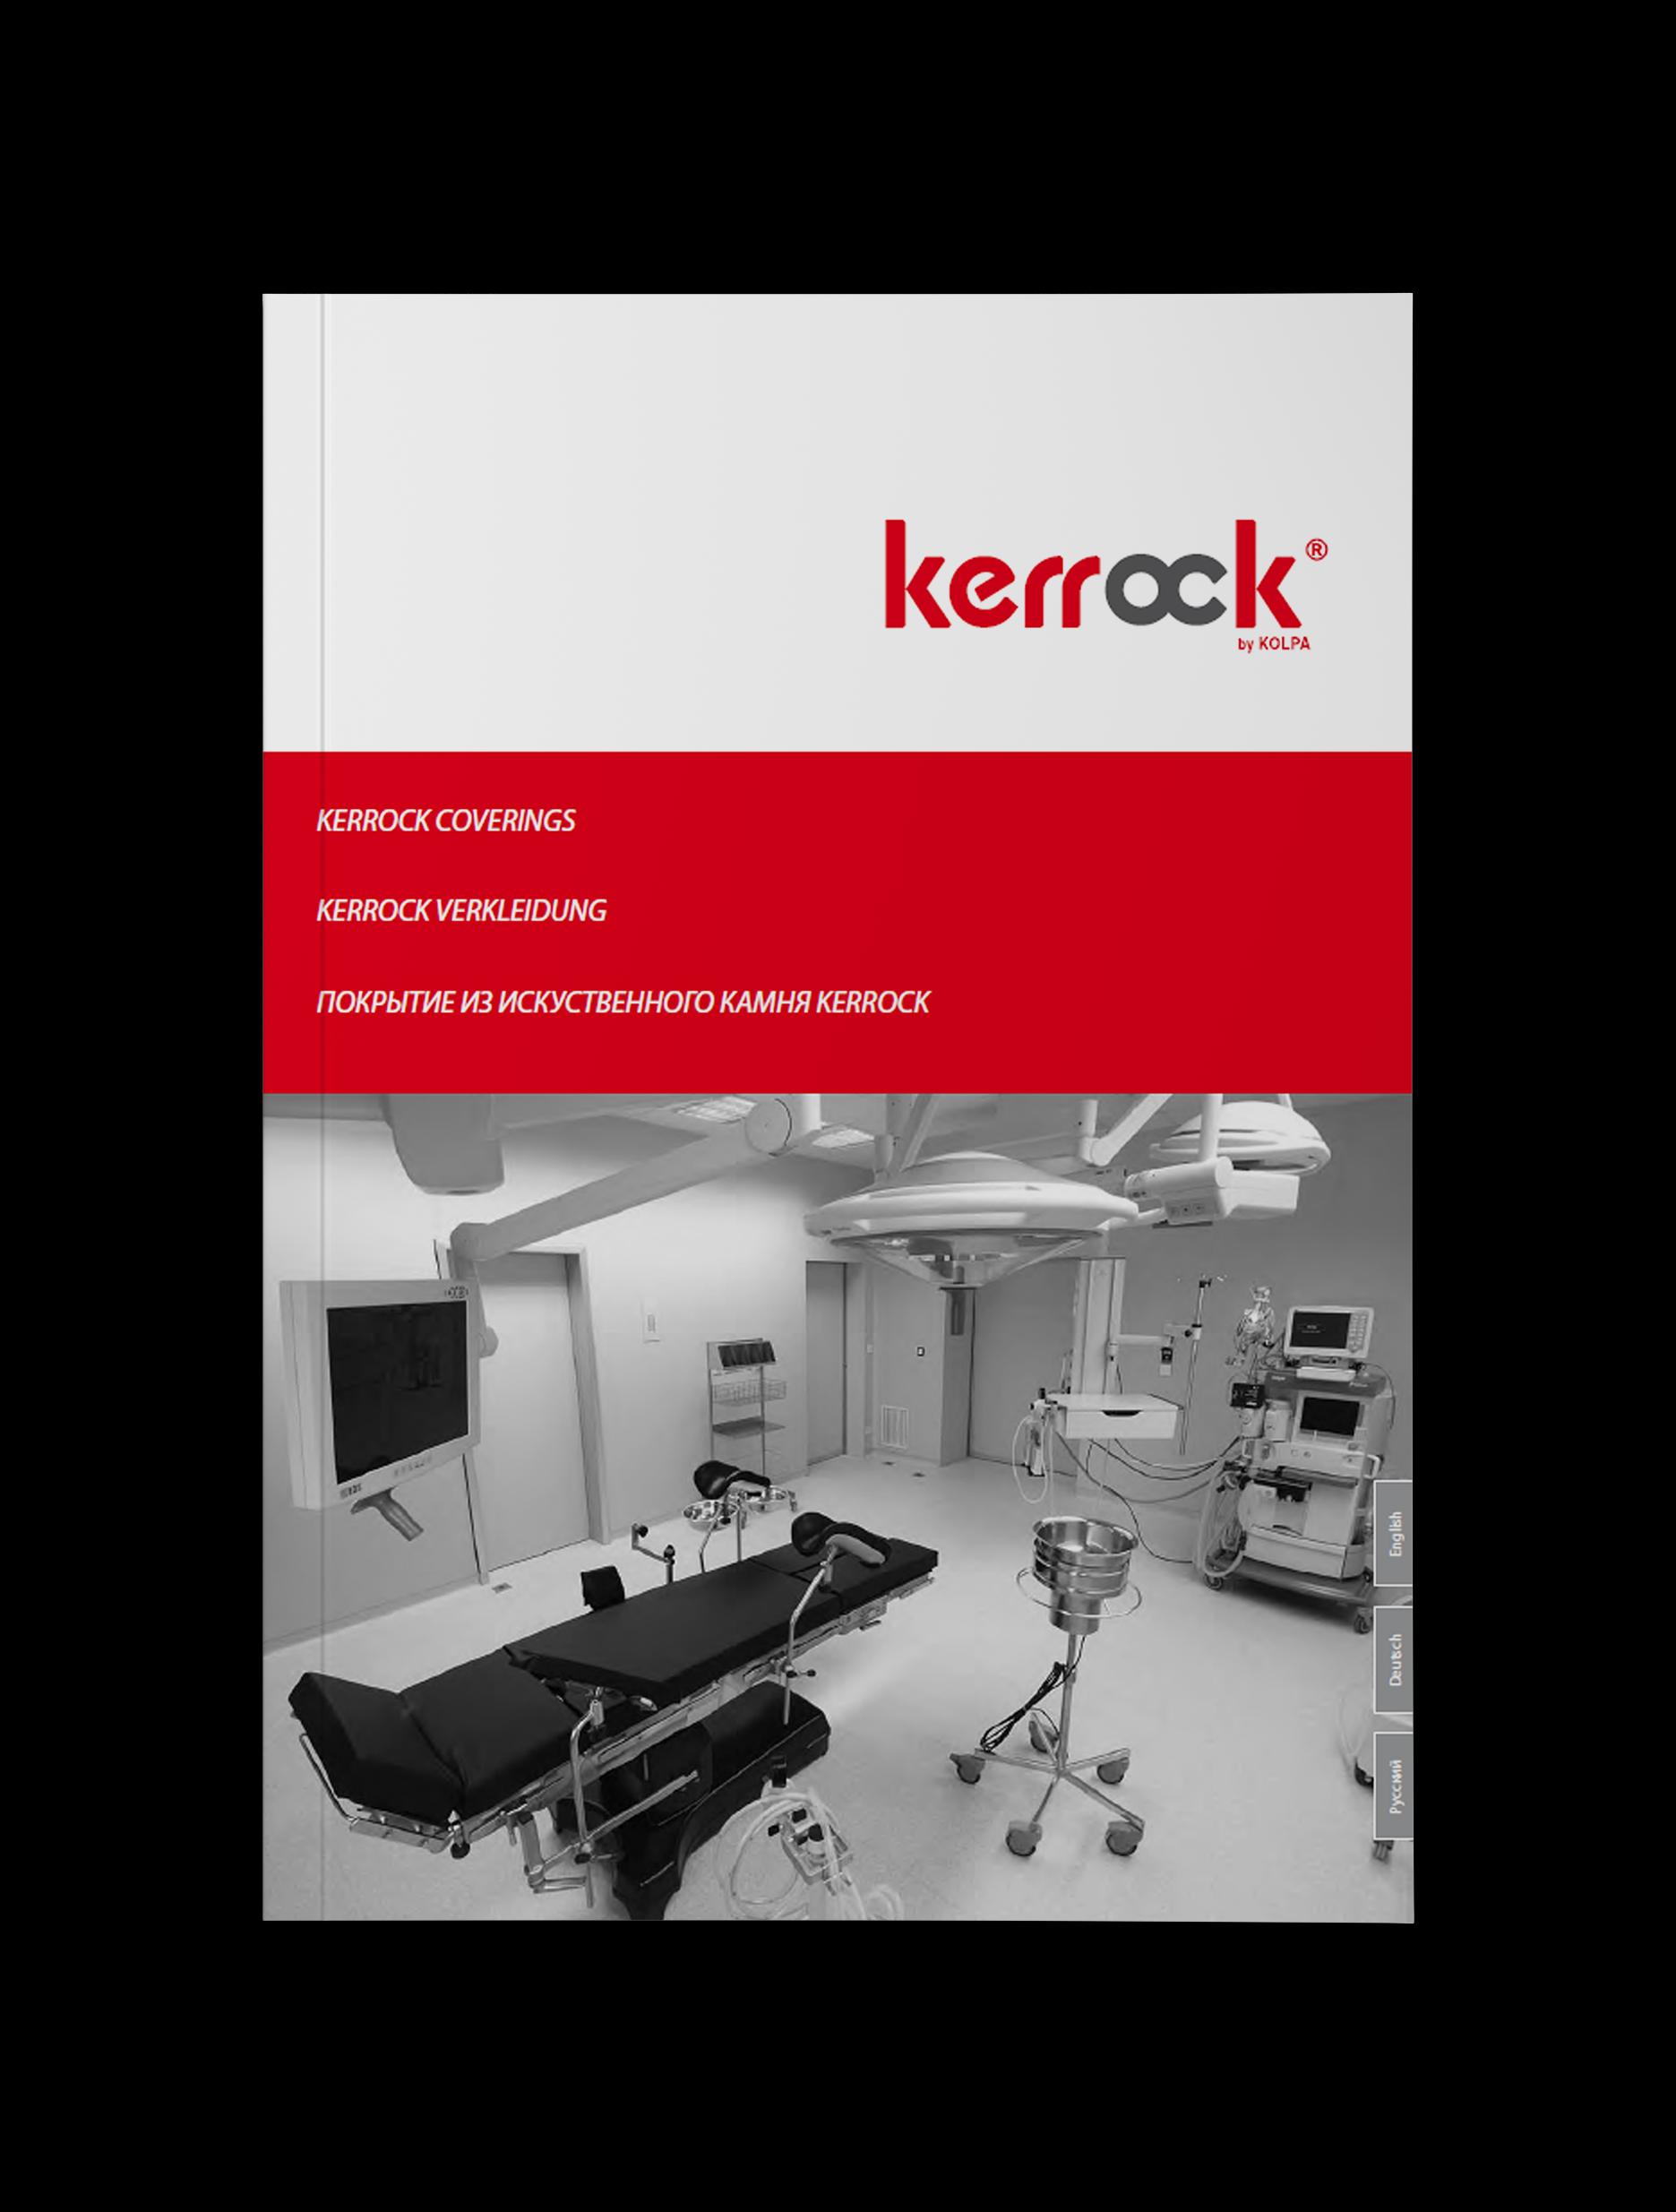 IMAGE - Kerrock